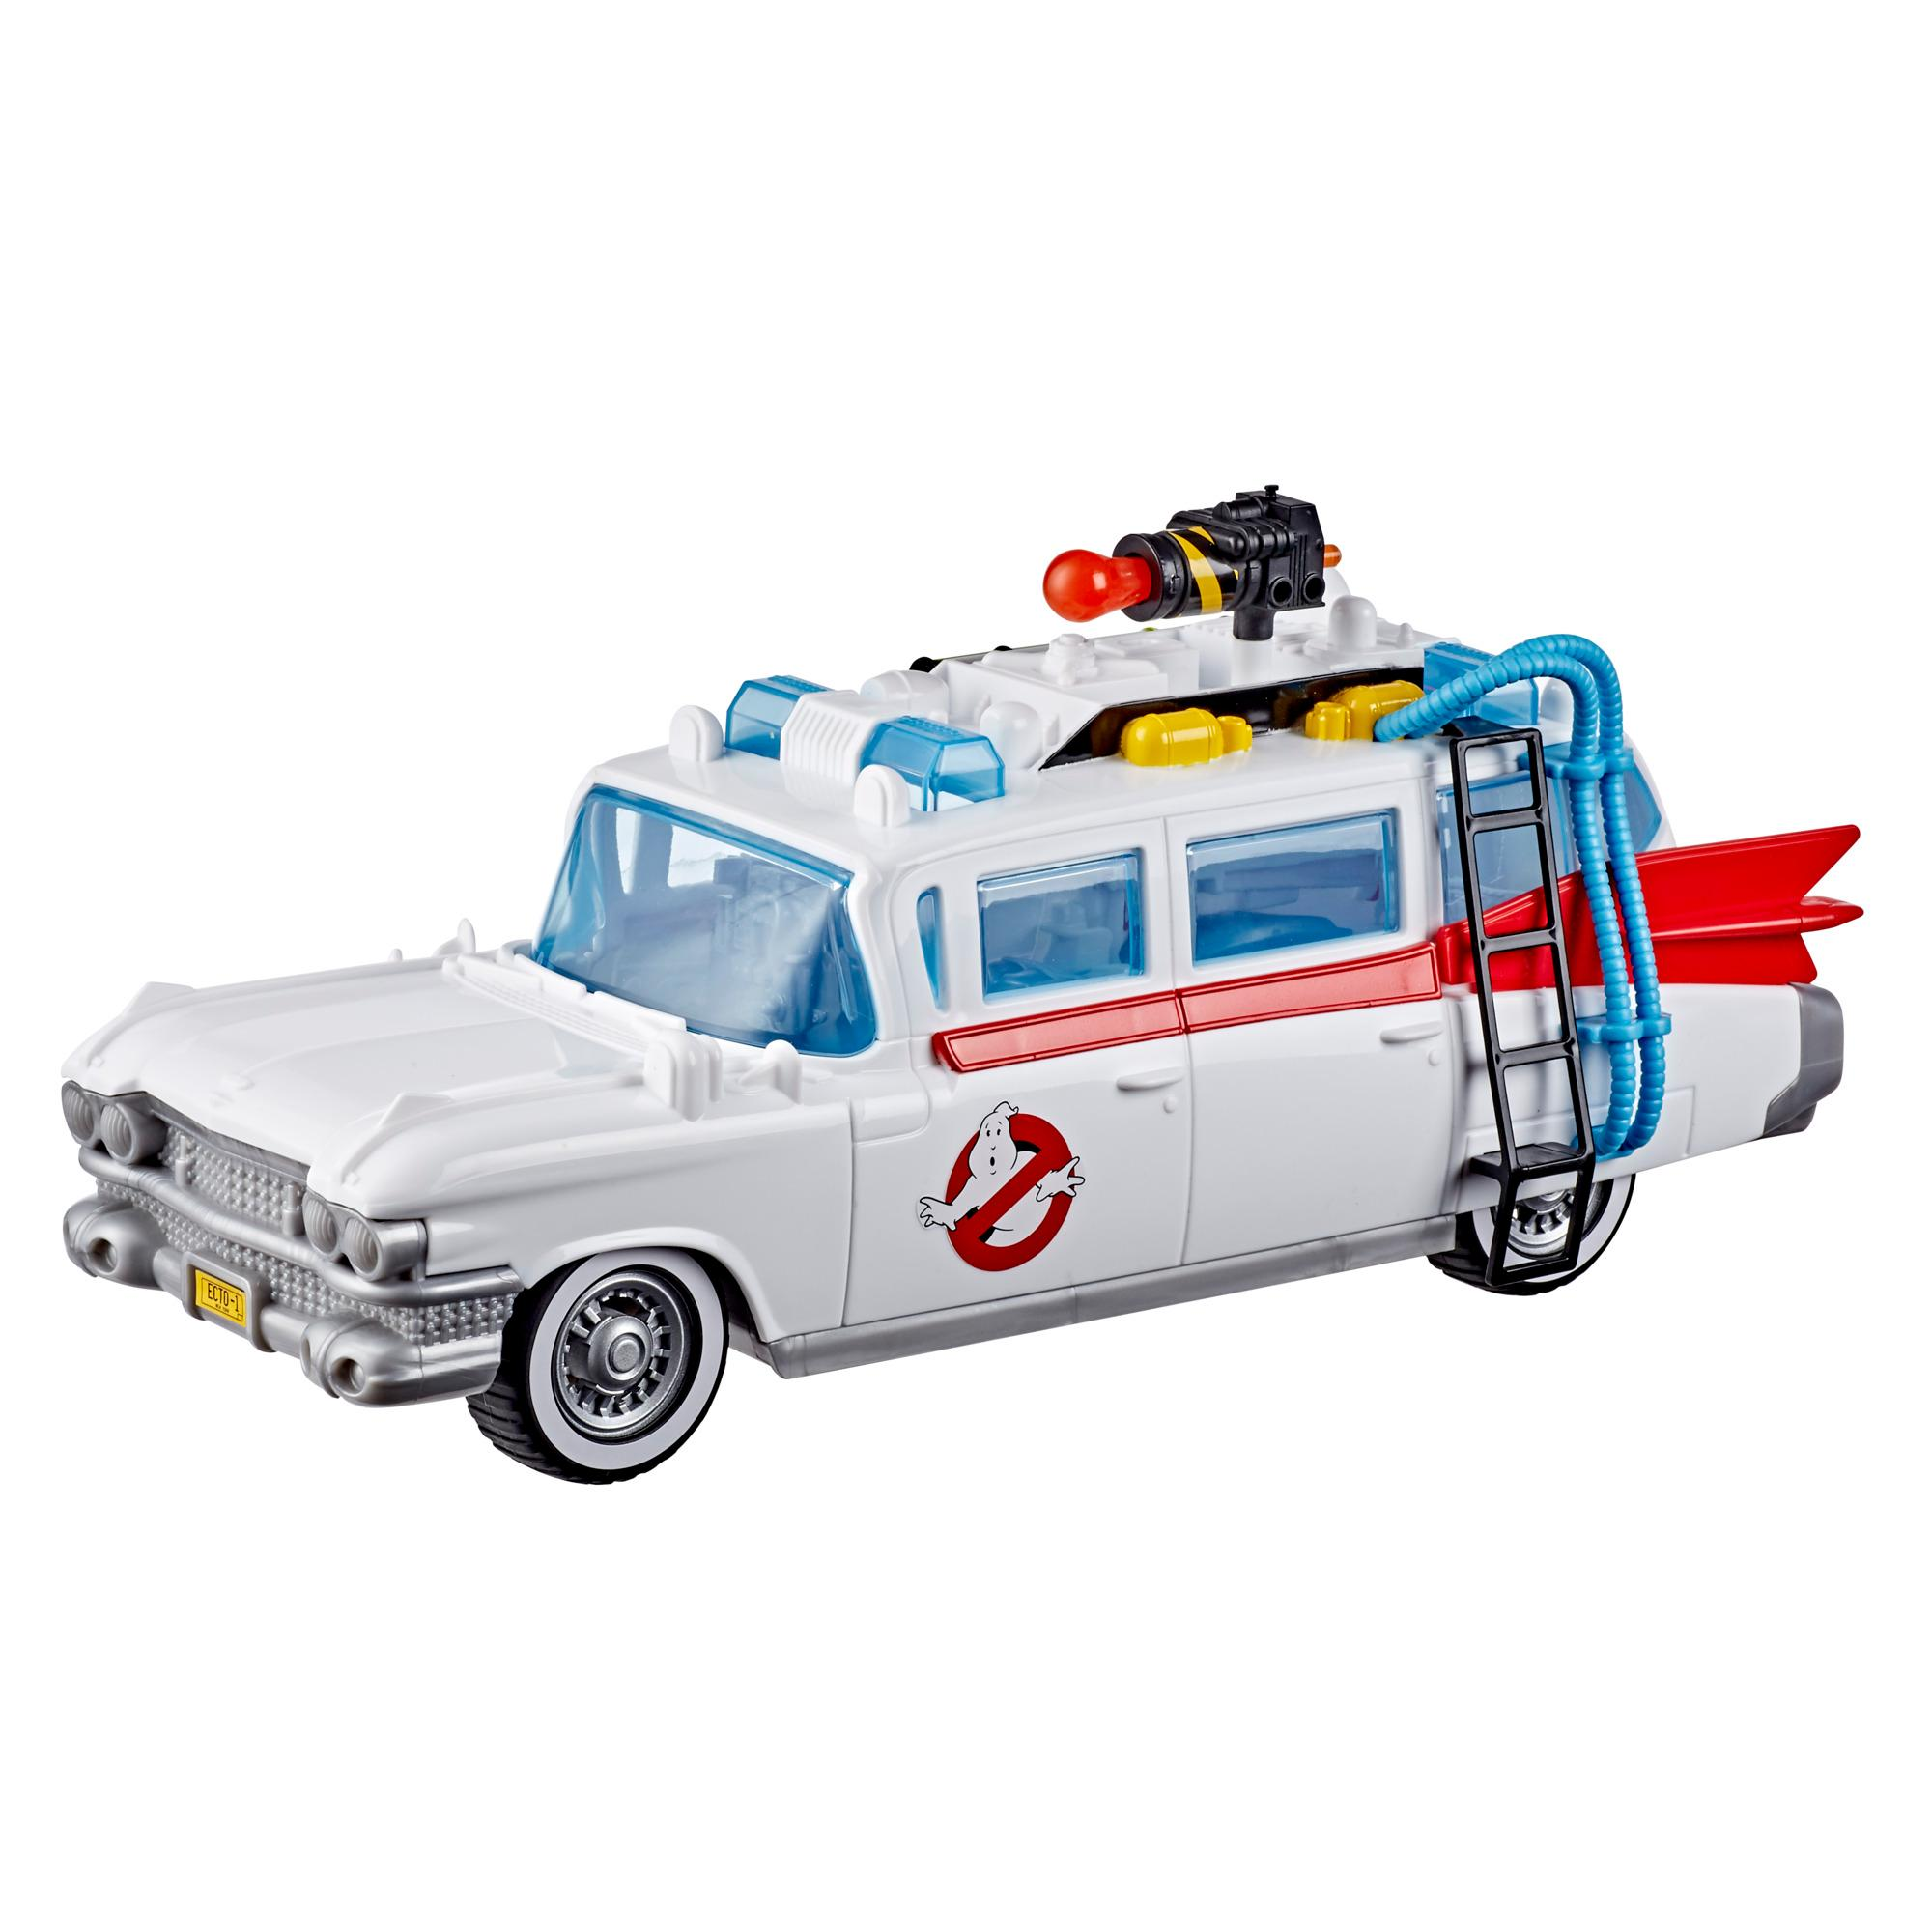 Ghostbusters Ecto-1 Fahrzeug